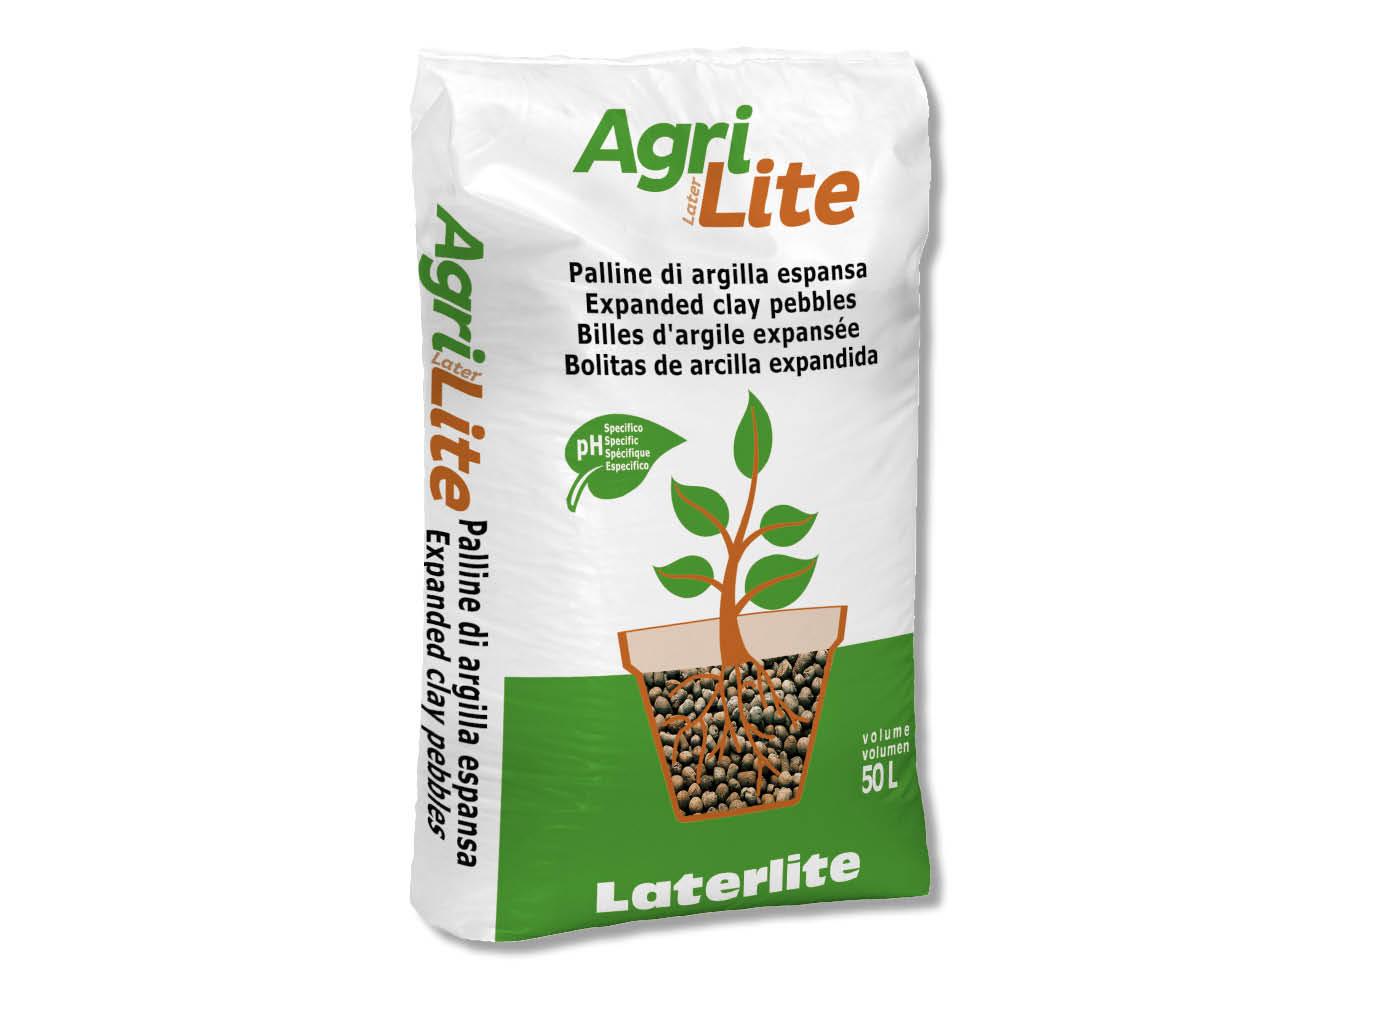 sacco-agrilaterlite-piante-vaso-50l-P44-2